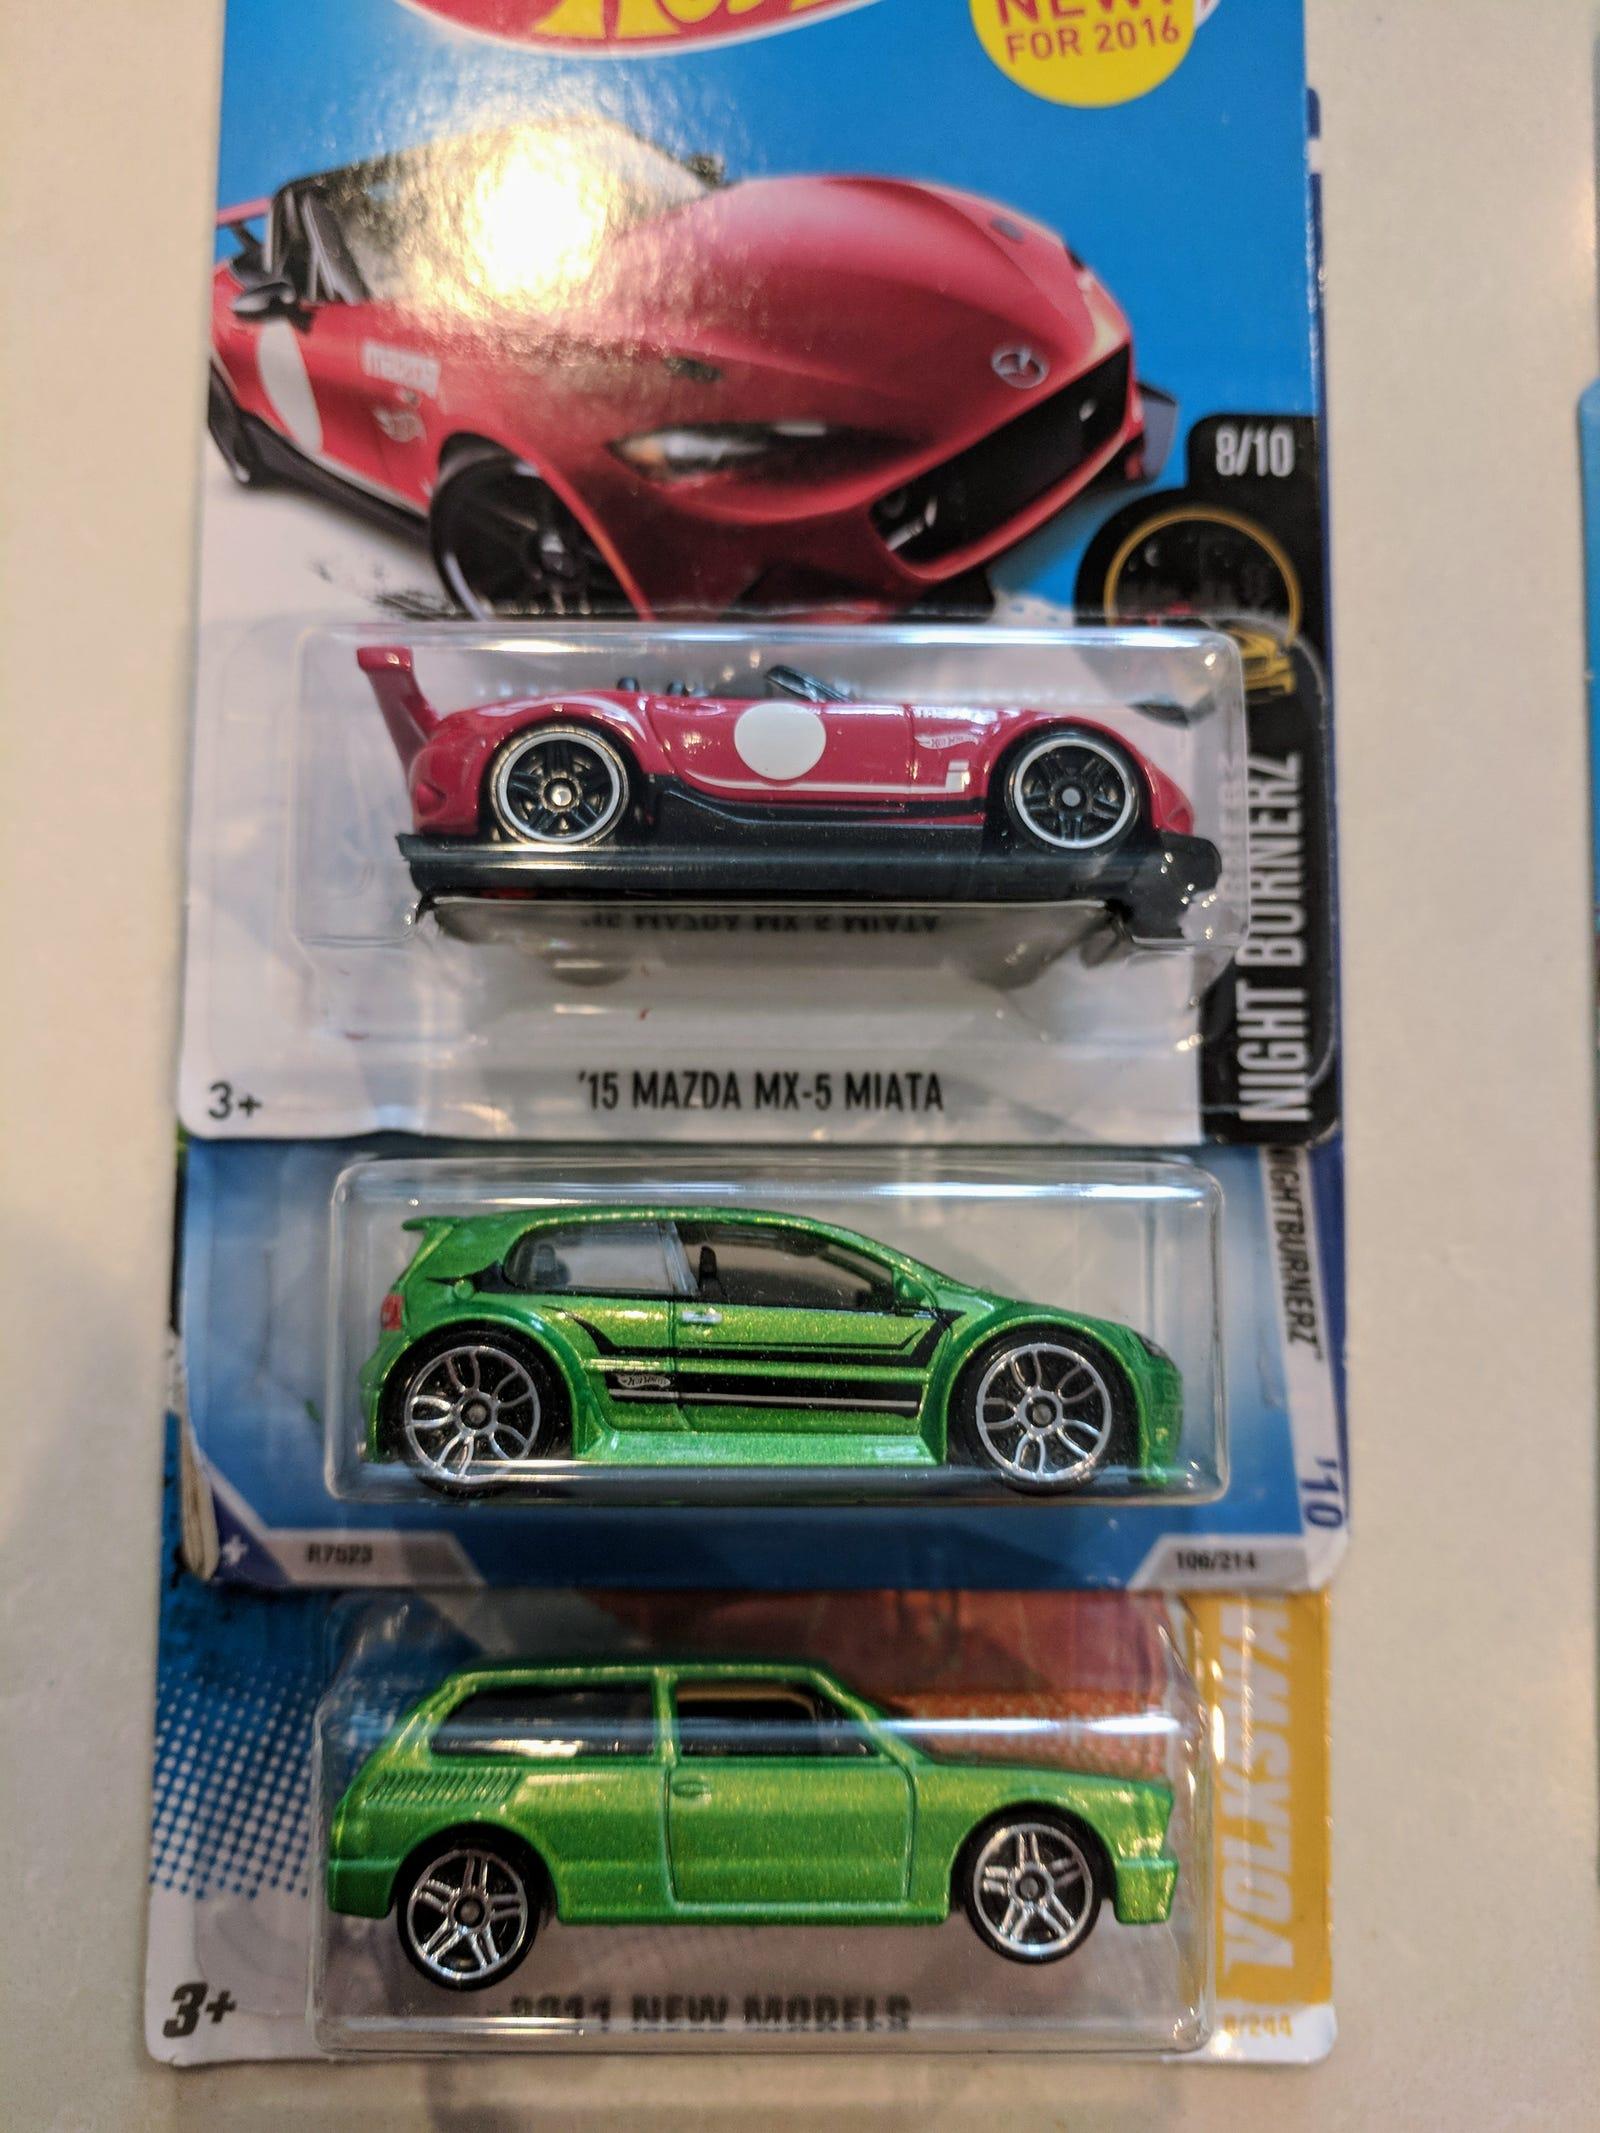 Lot 24: Fan Boi collection - $5 for 8 cars including a ND Miata, Mk6 GTI, VW Brasilia...